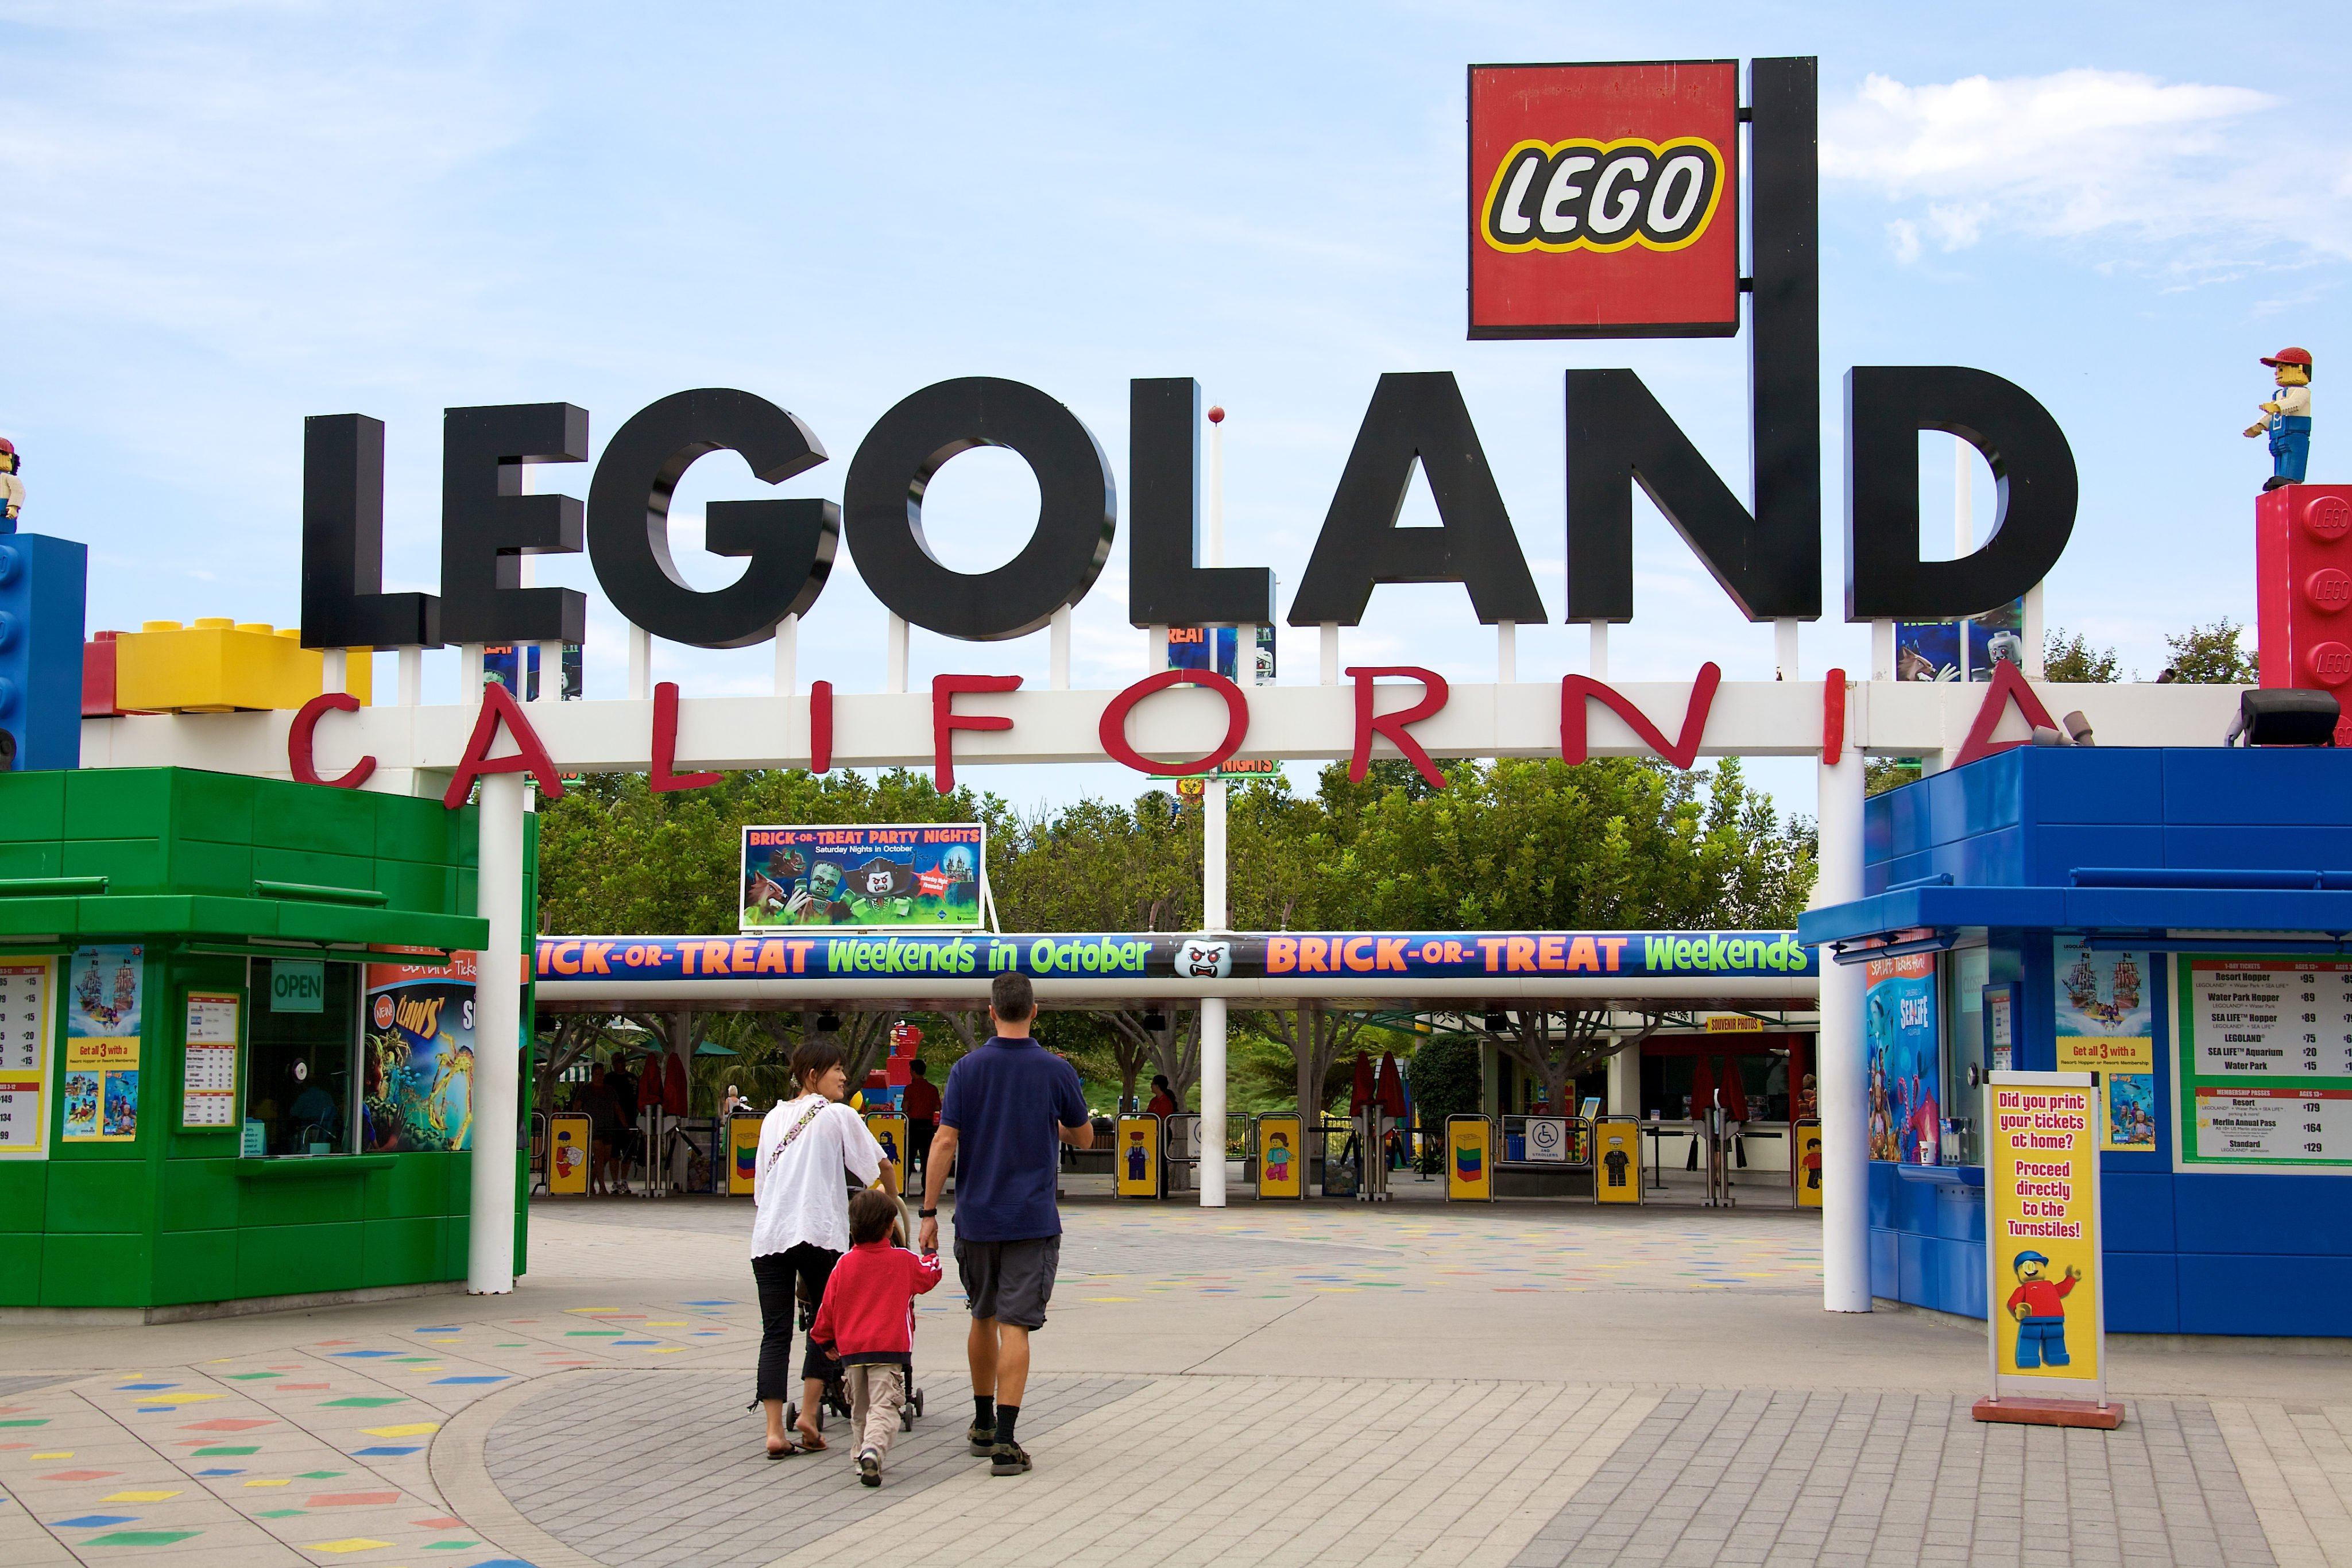 9 Legoland Locations Offering Free Kids Ticket | Money ...